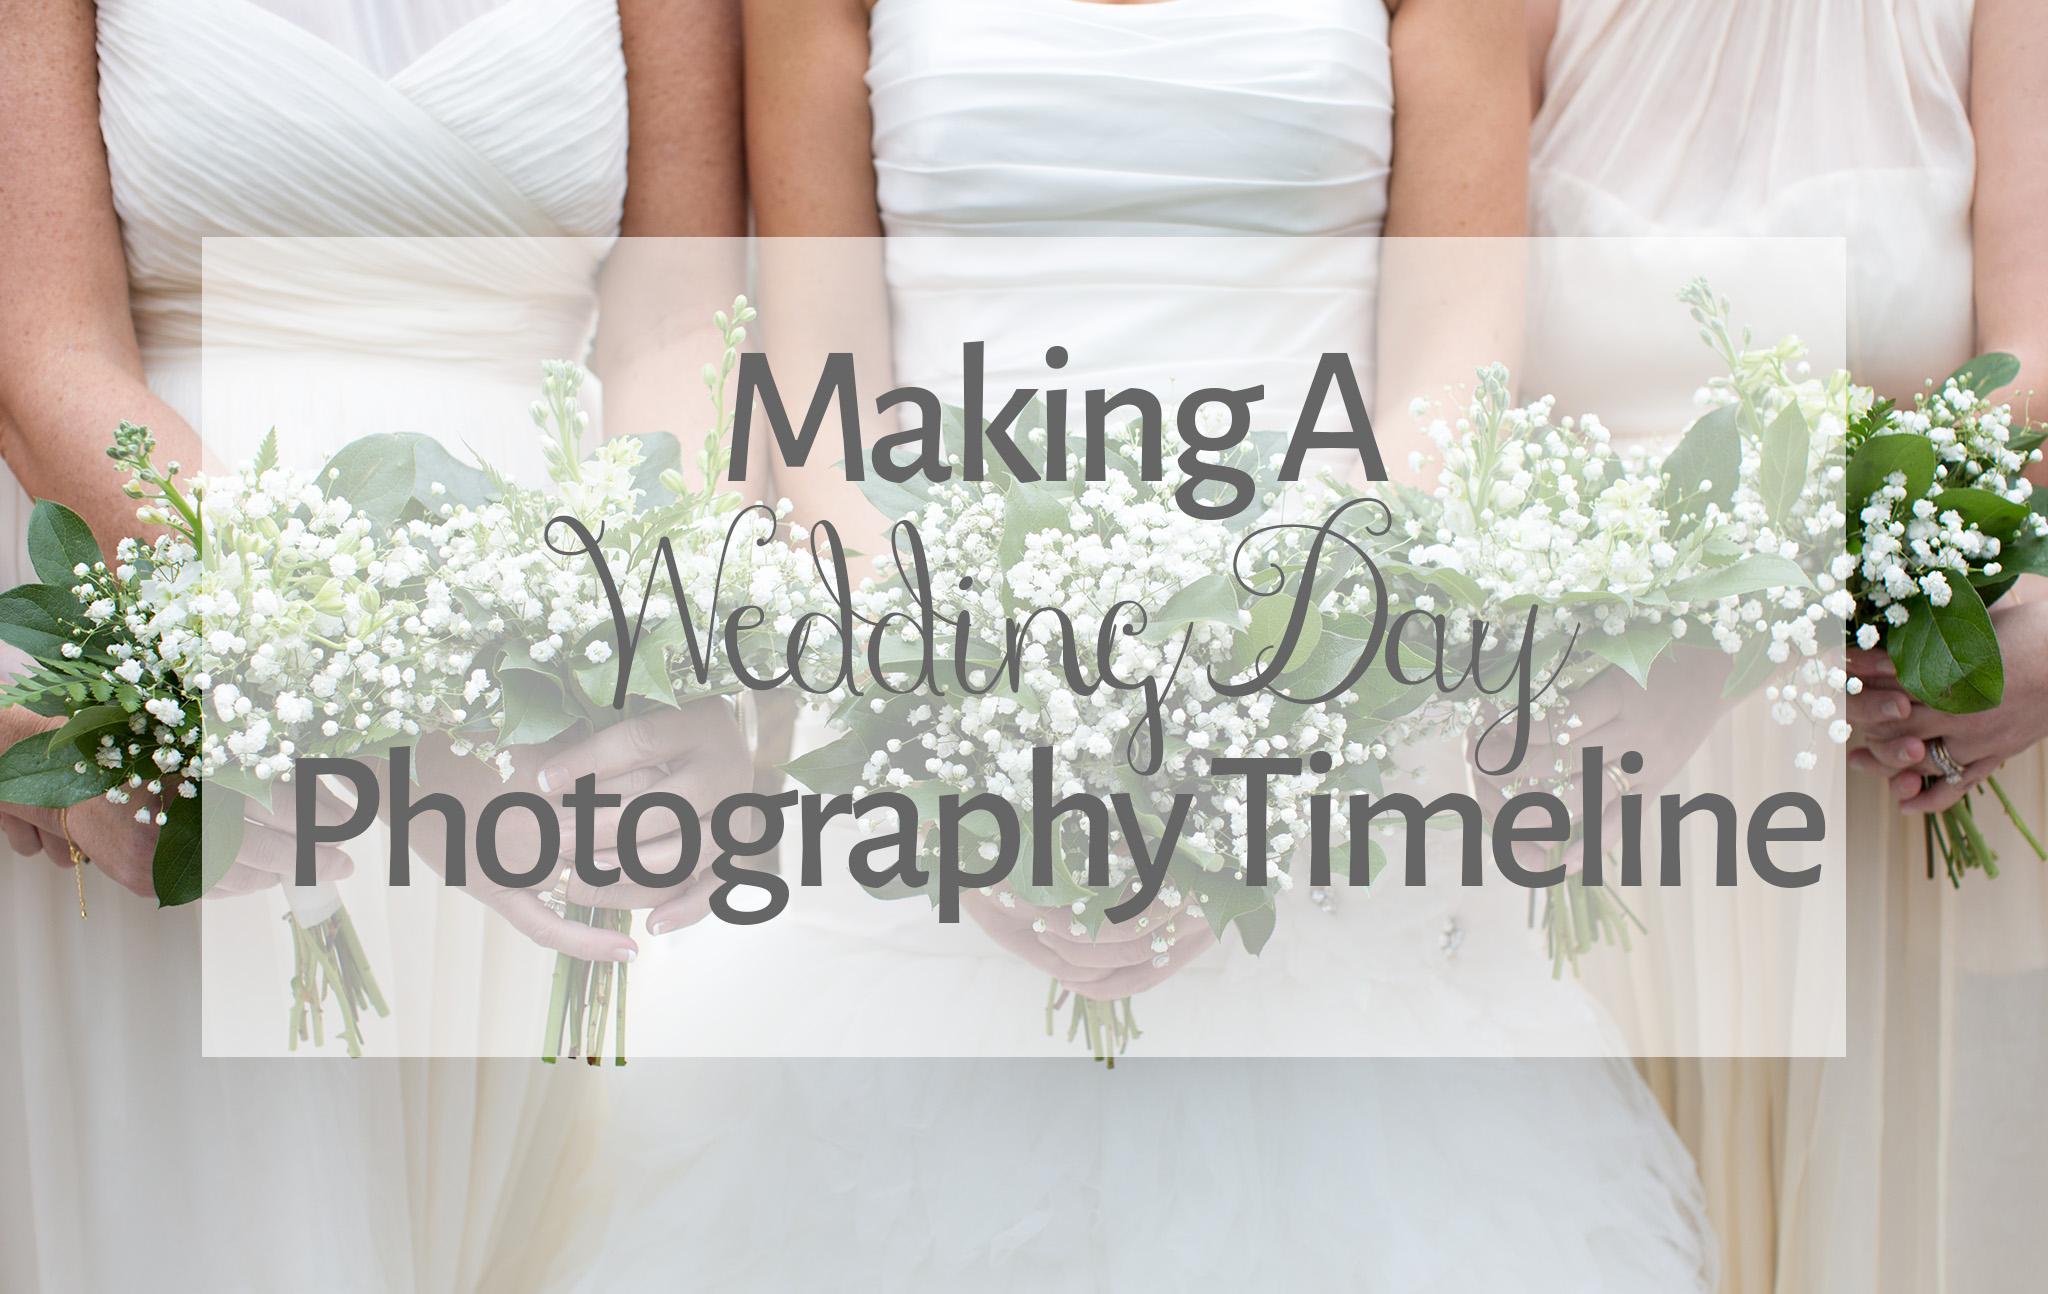 Wedding Day Photography Timeline_DiPrima Photography_NC Wedding Photographer